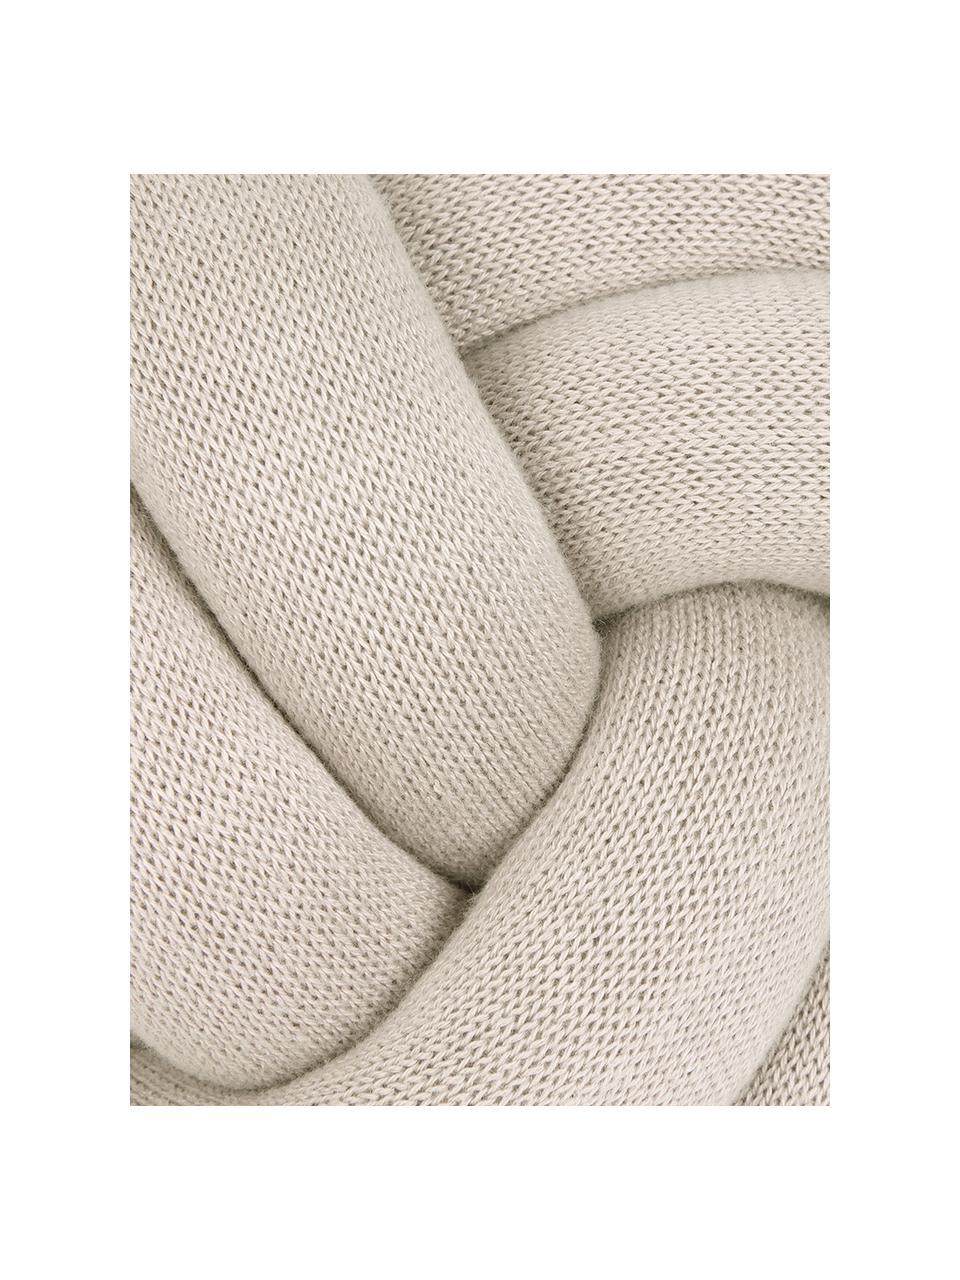 Cuscino beige chiaro Twist, Beige chiaro, Ø 30 cm